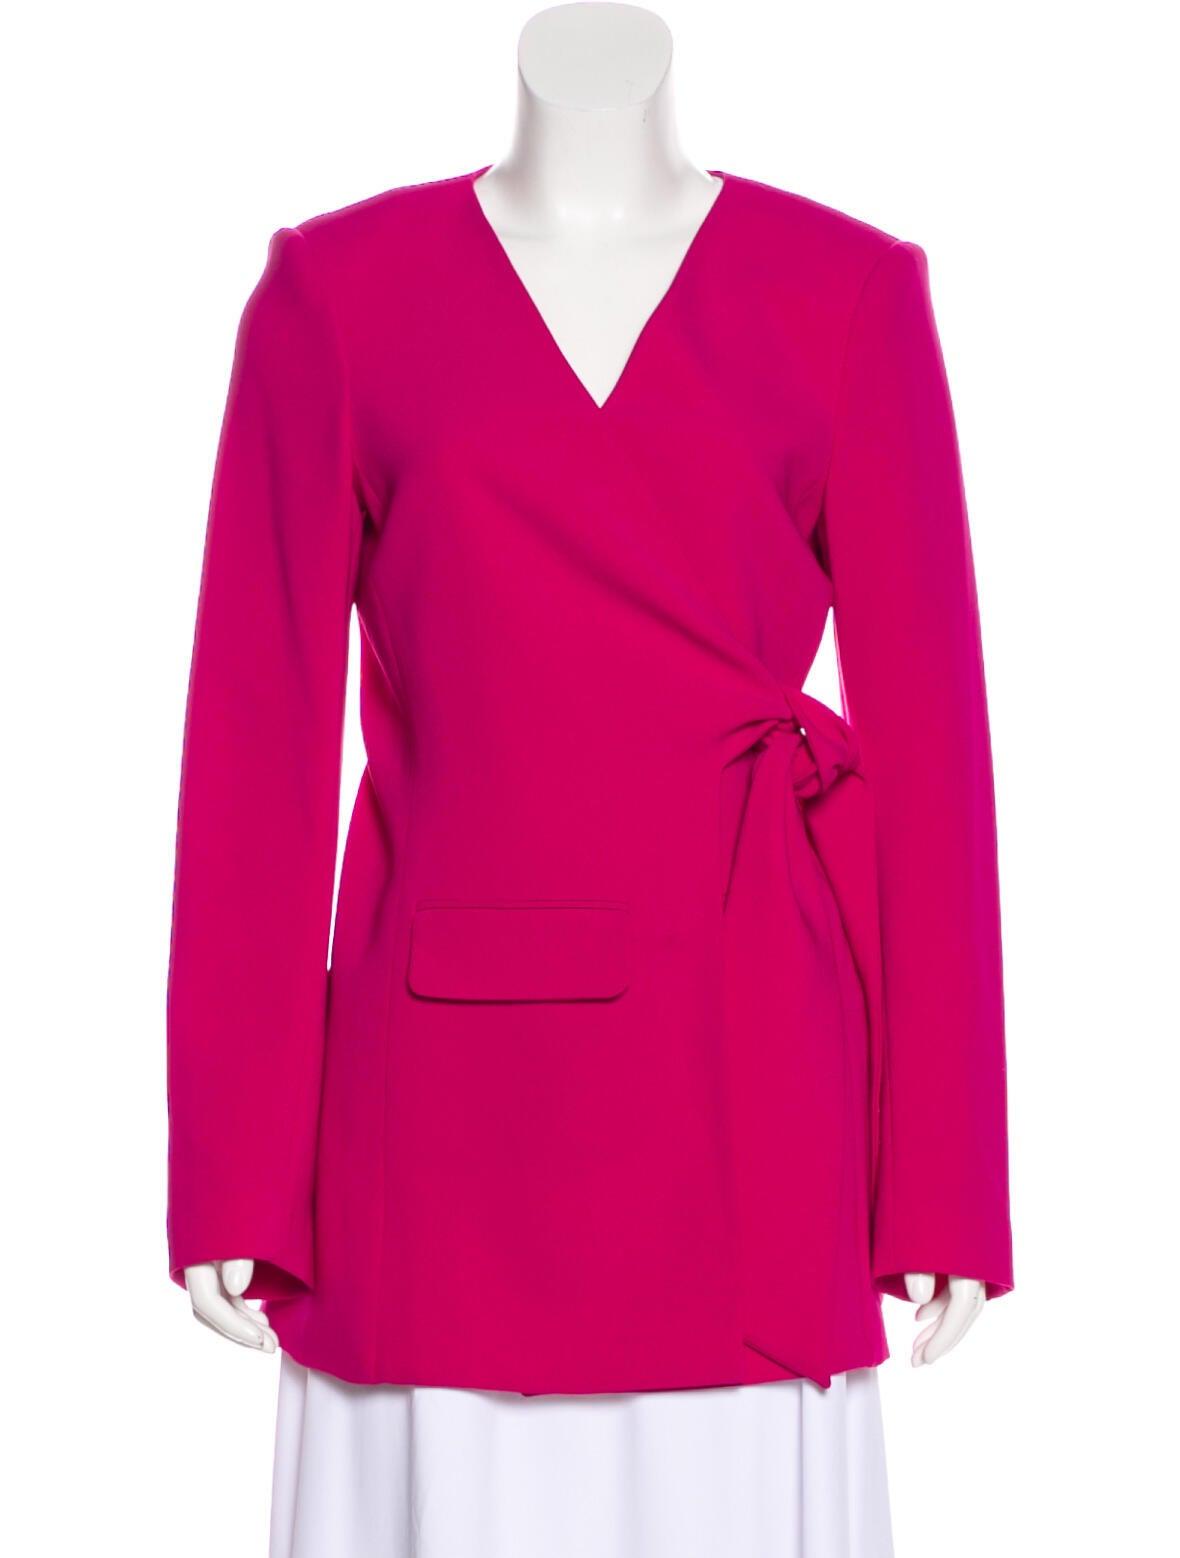 Diane von Furstenberg Evening Jacket - Clothing -           WDI232512 | The RealReal